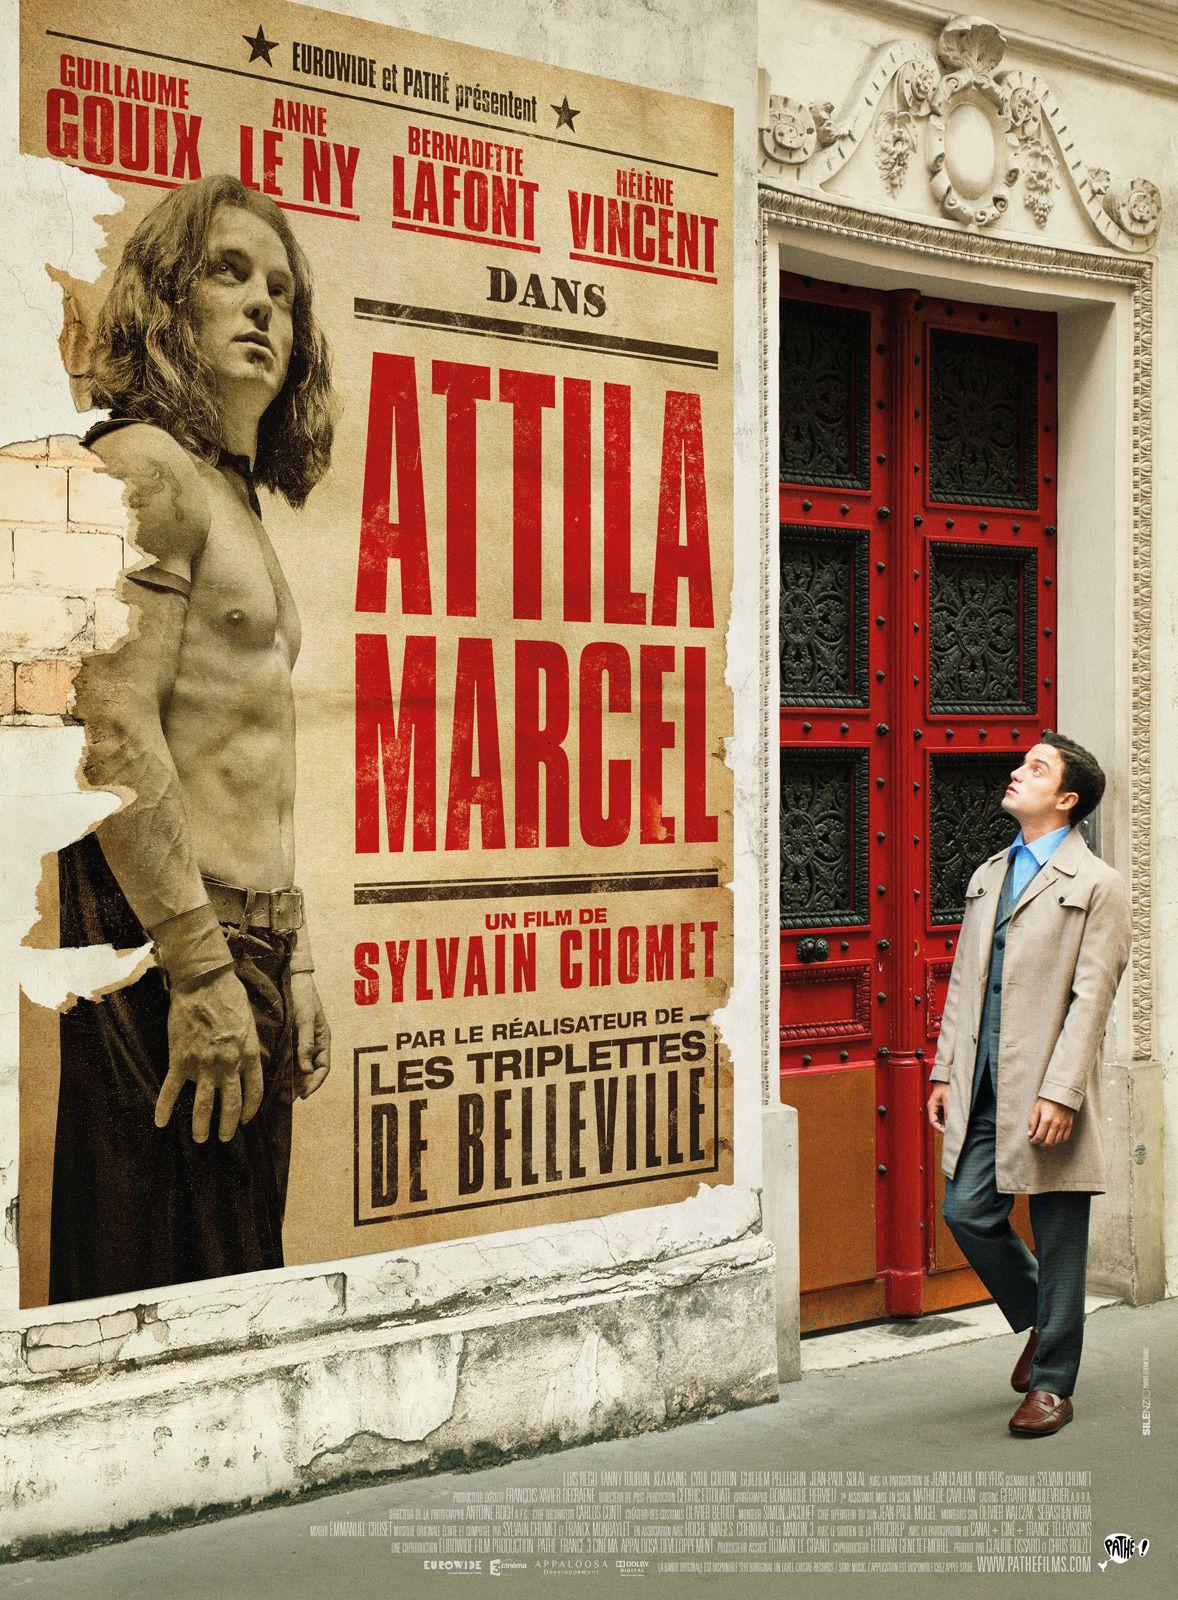 Attila Marcel - Film (2013)